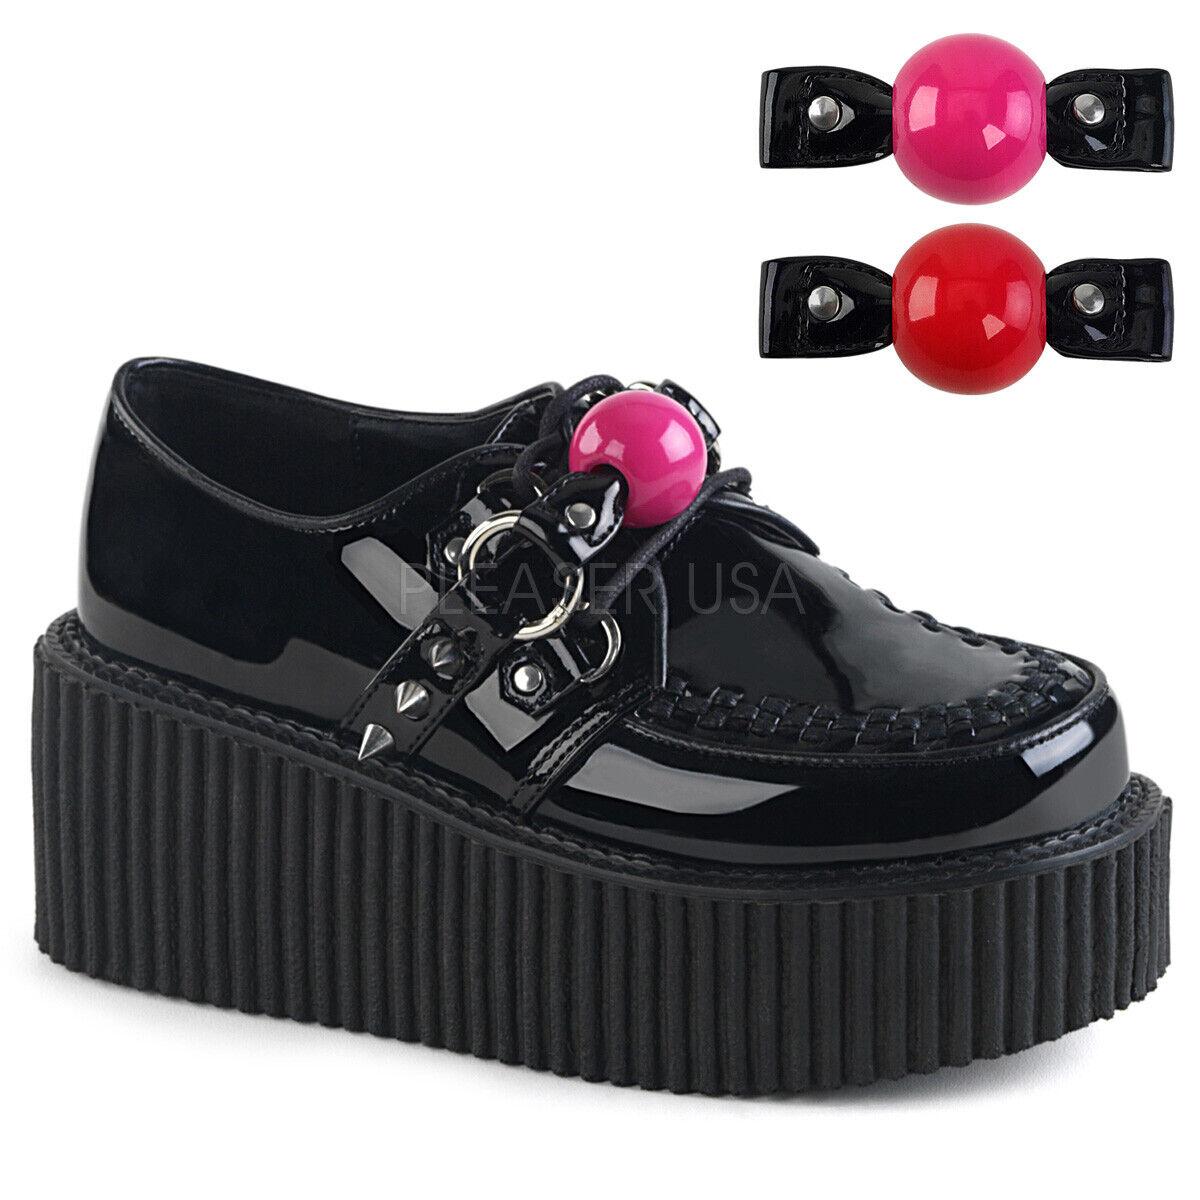 PLEASER Demonia Creeper-222 3  Platform Oxford Creeper W  Changable Ball Gag